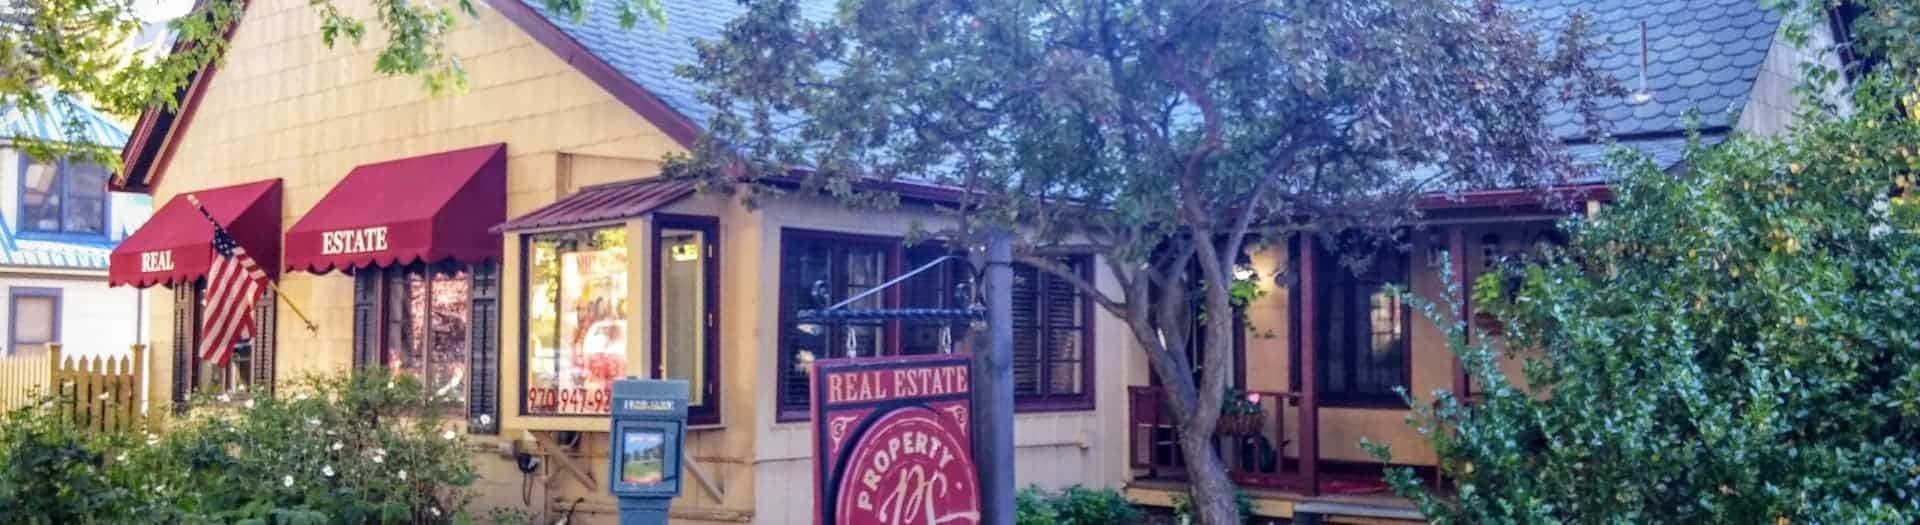 The Property Shop, Inc.   Glenwood Springs, CO